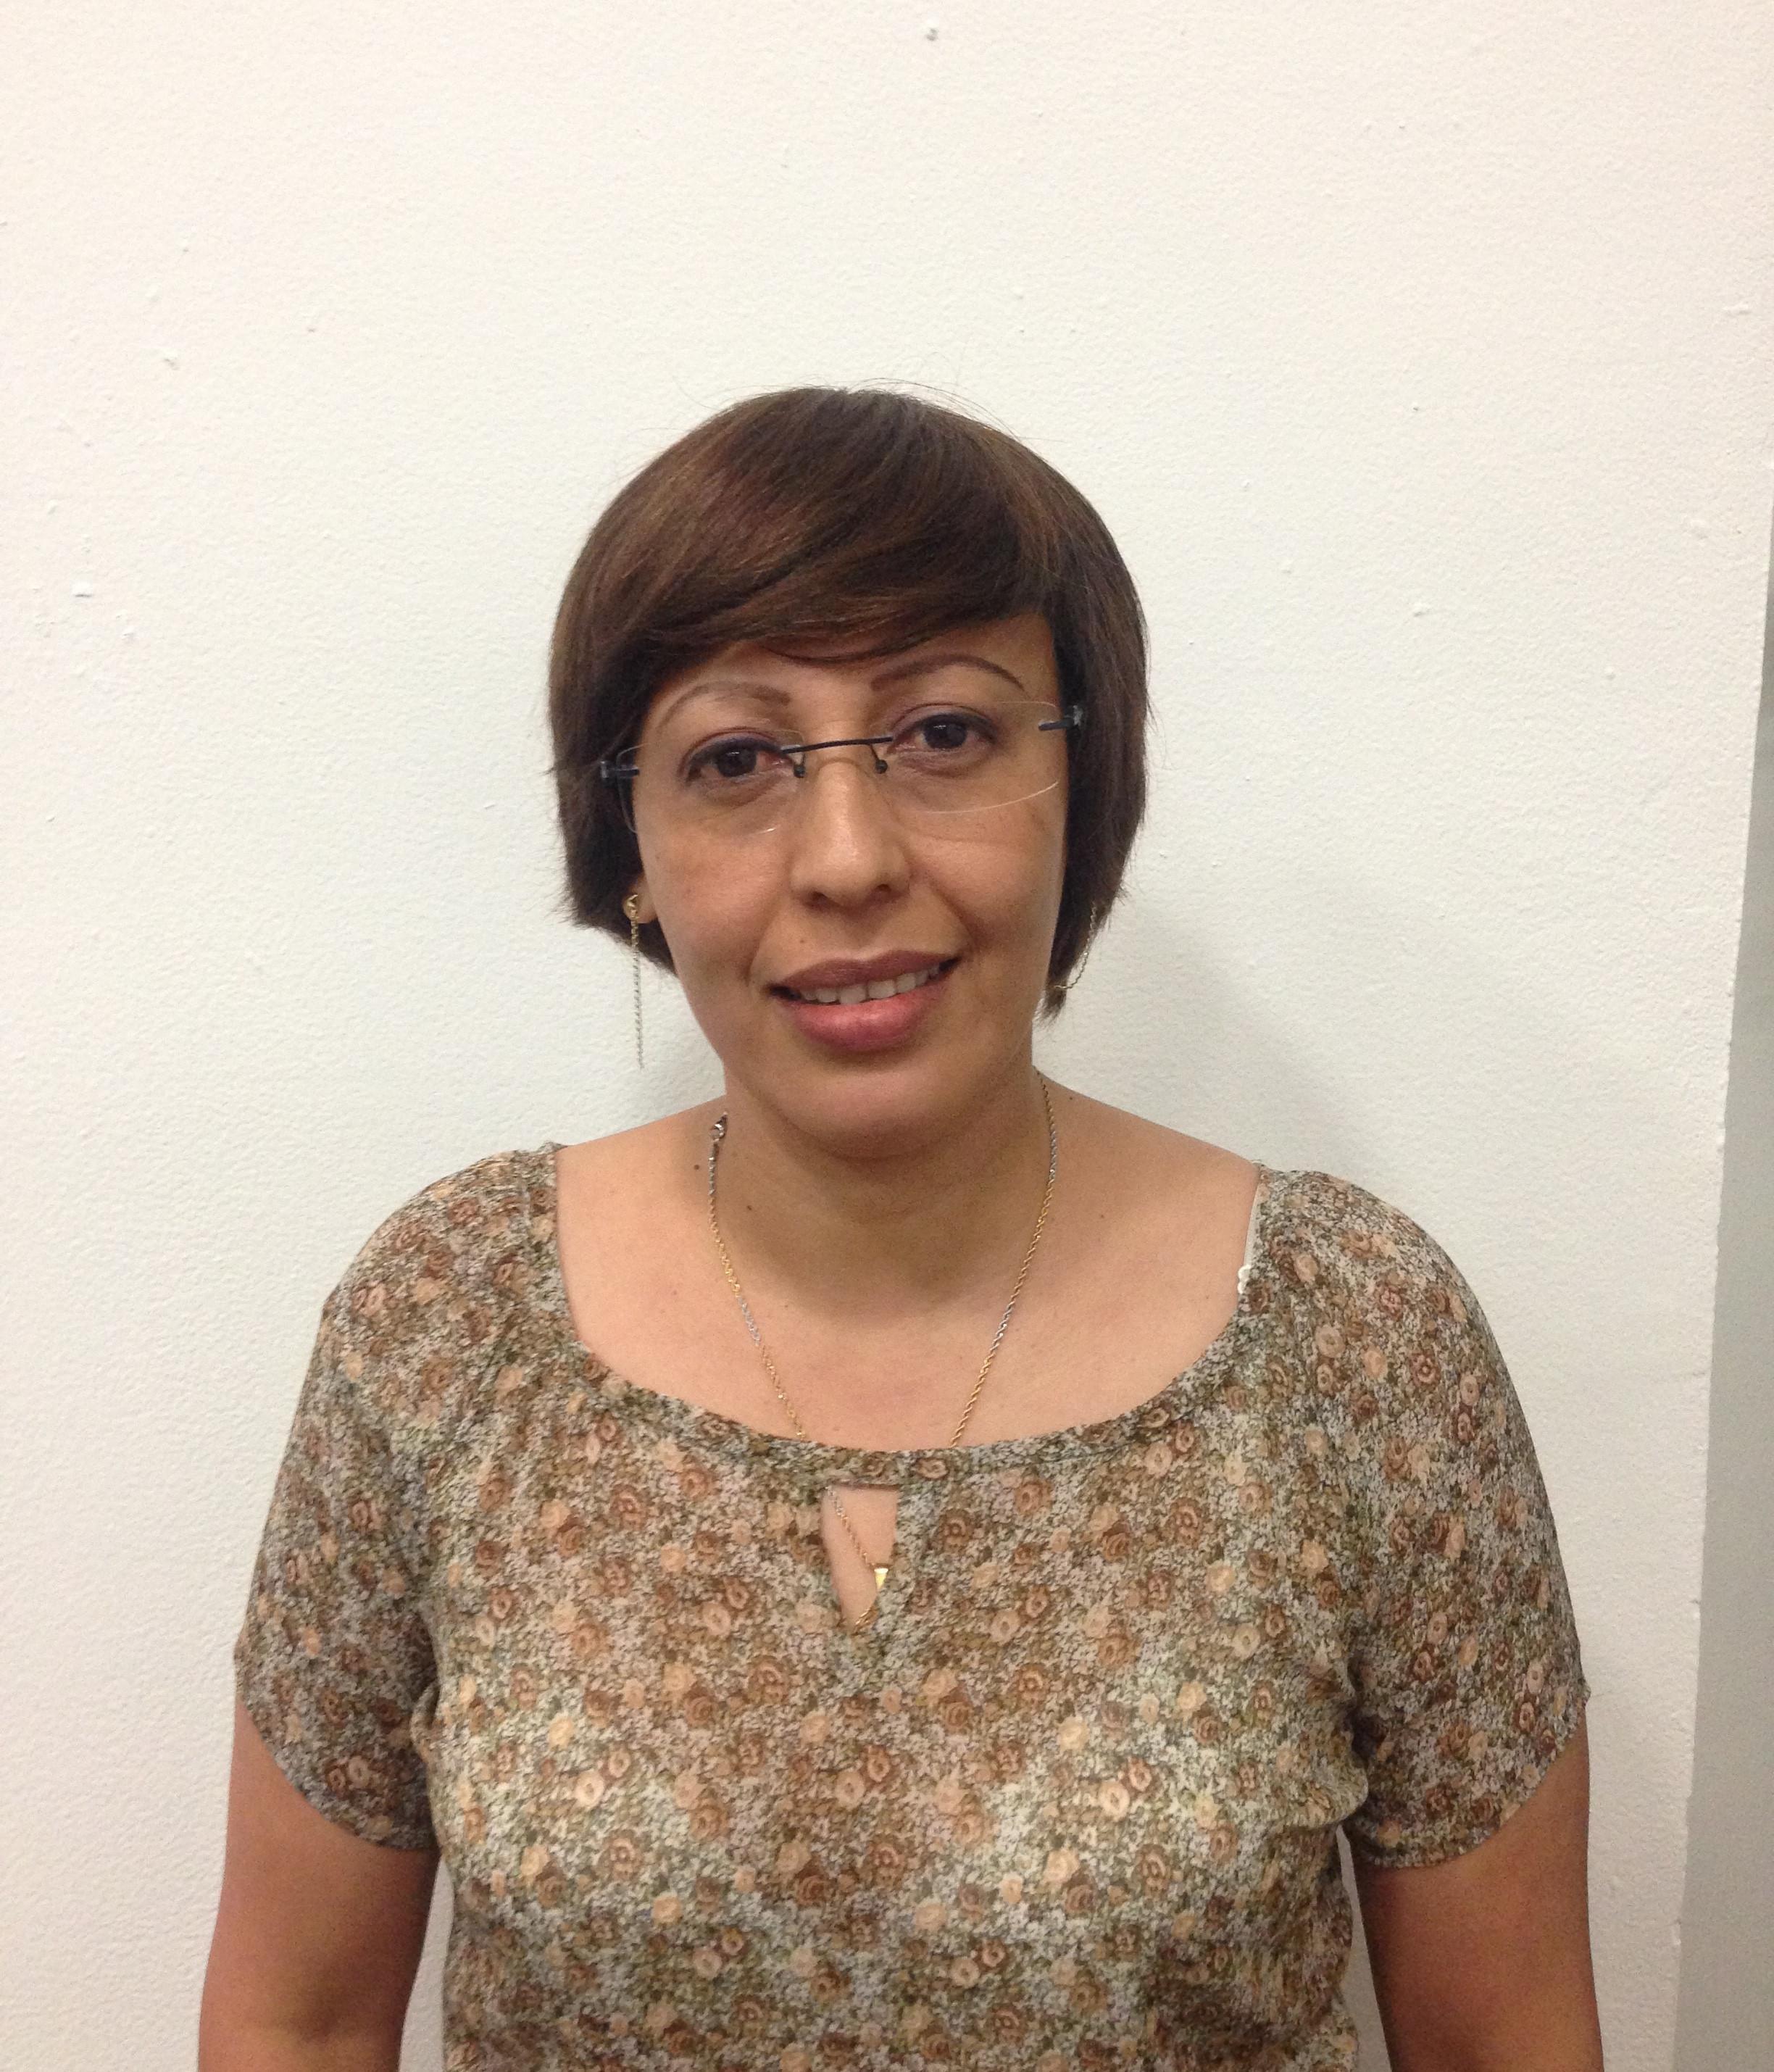 Dra. Alma Rocío Díaz Romero